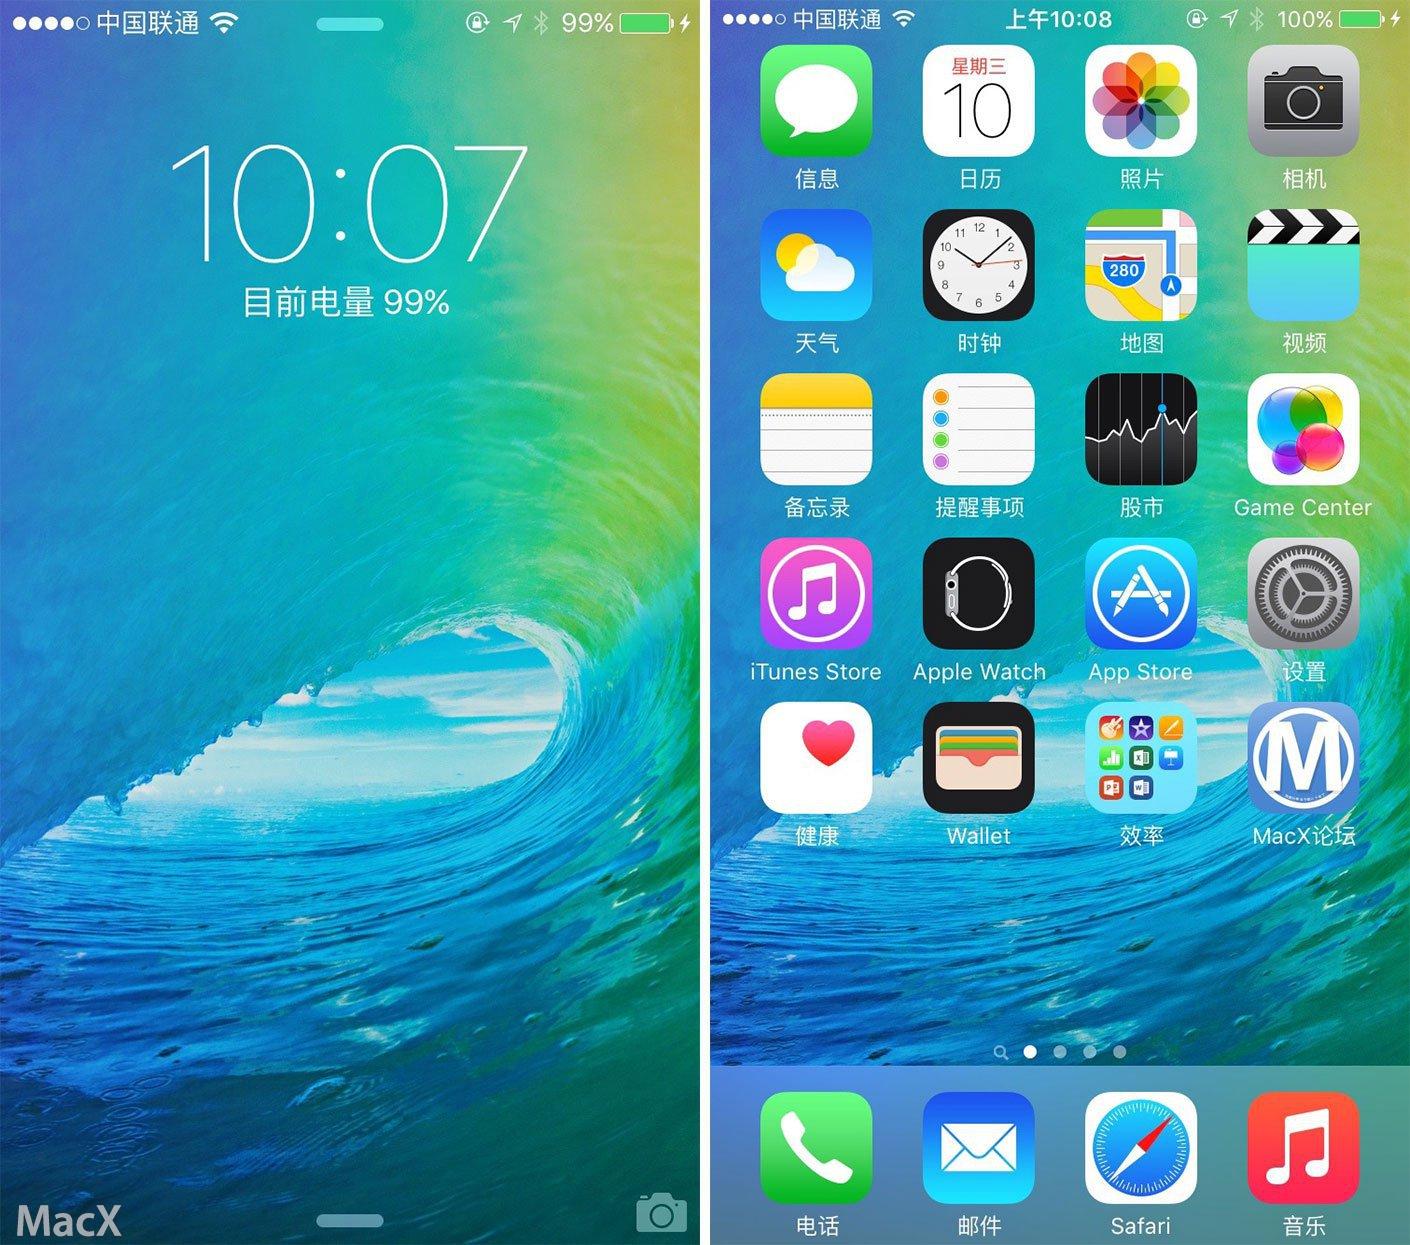 24080130 n4Gz 苹果向开发者发布 iOS 9 第二个测试版